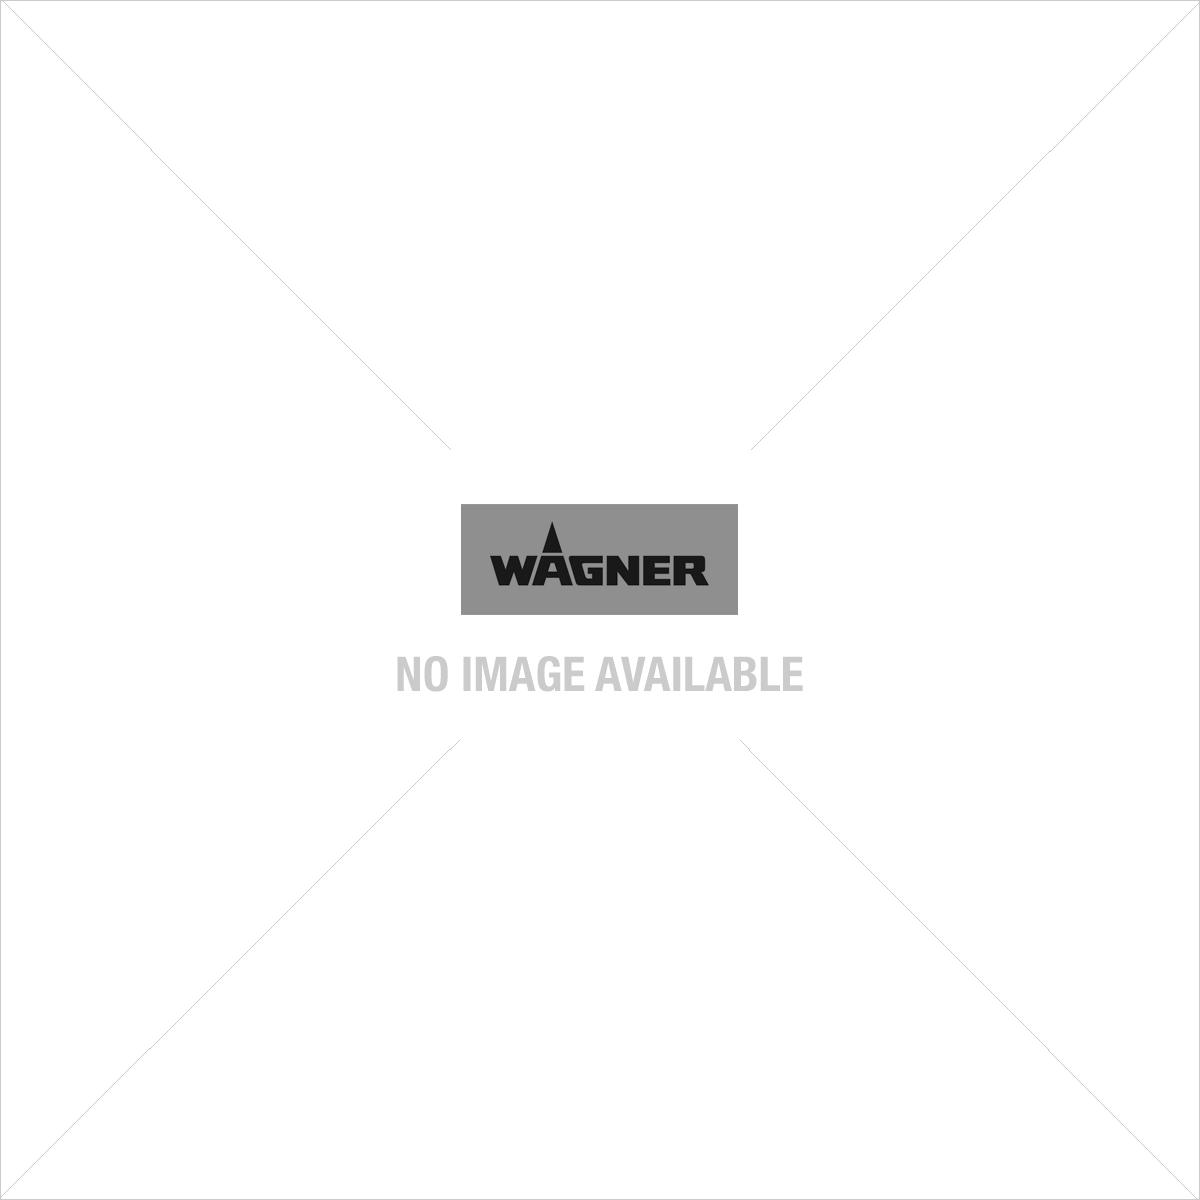 Wagner powerpainter 60 pistolet peinture airless - Pistolet peinture airless ...